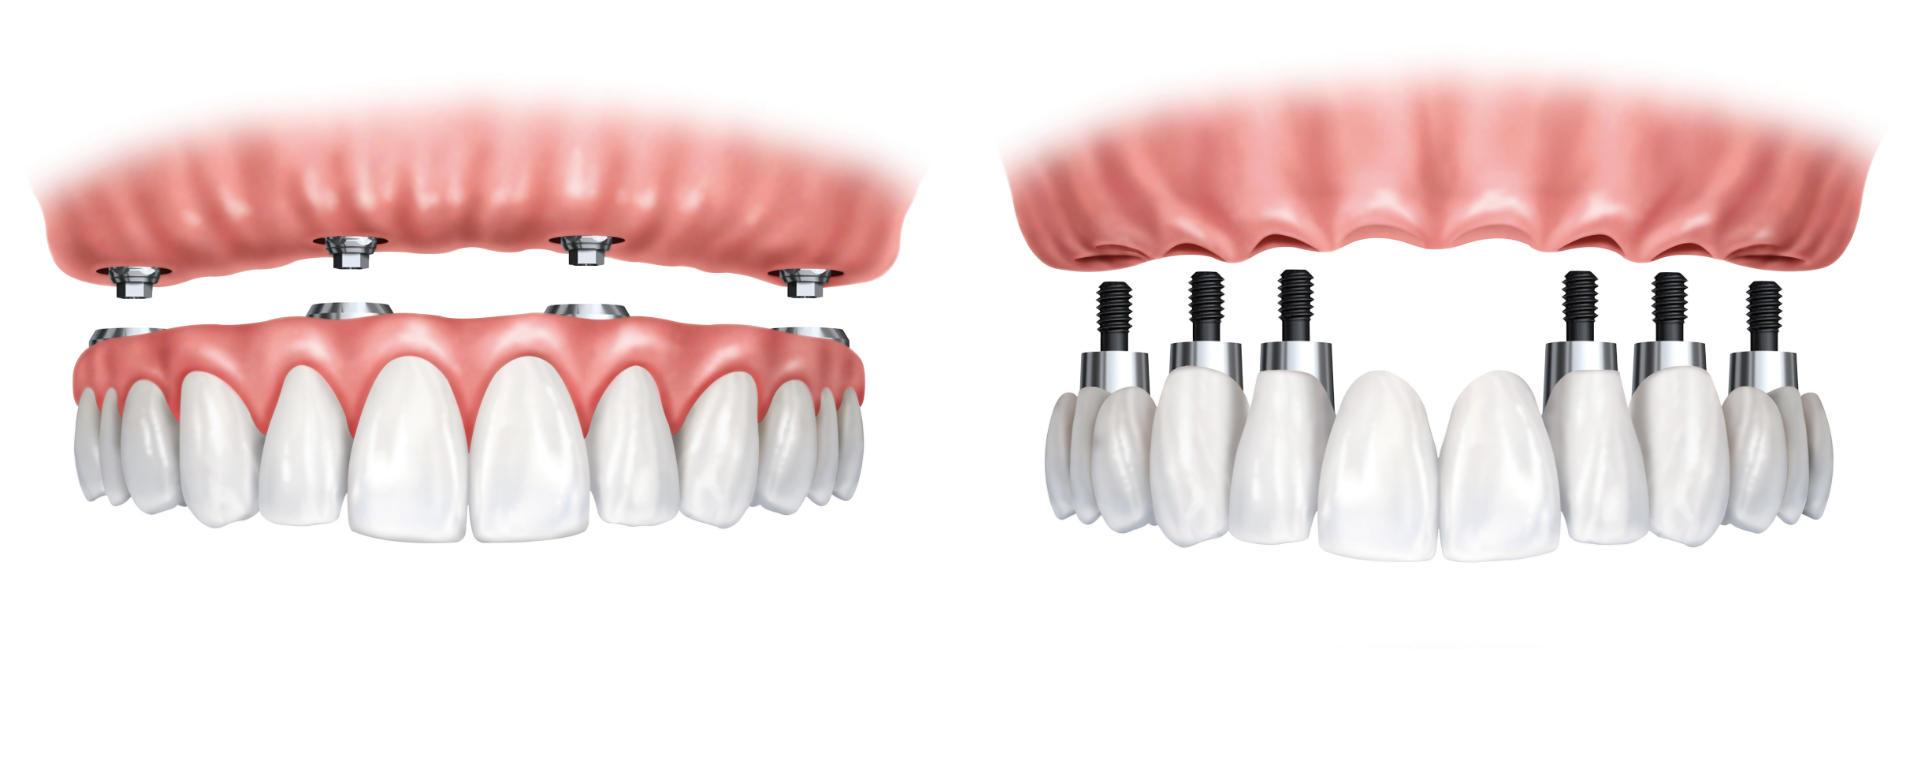 Models of implants